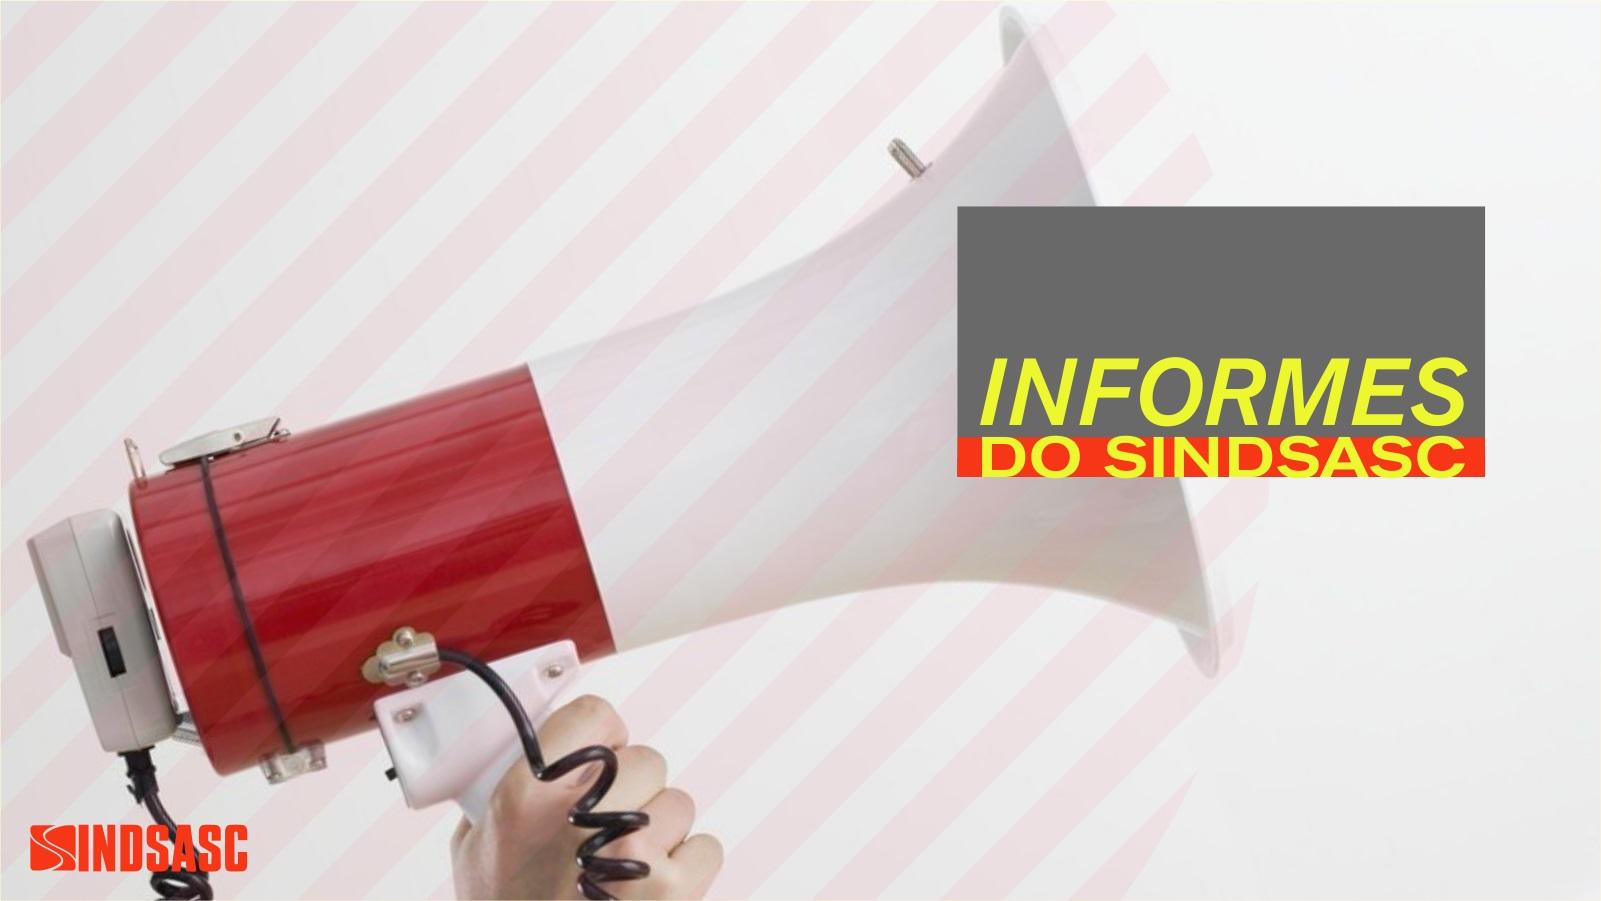 INFORMES DO SINDSASC Terça-feira, 18 de agosto.